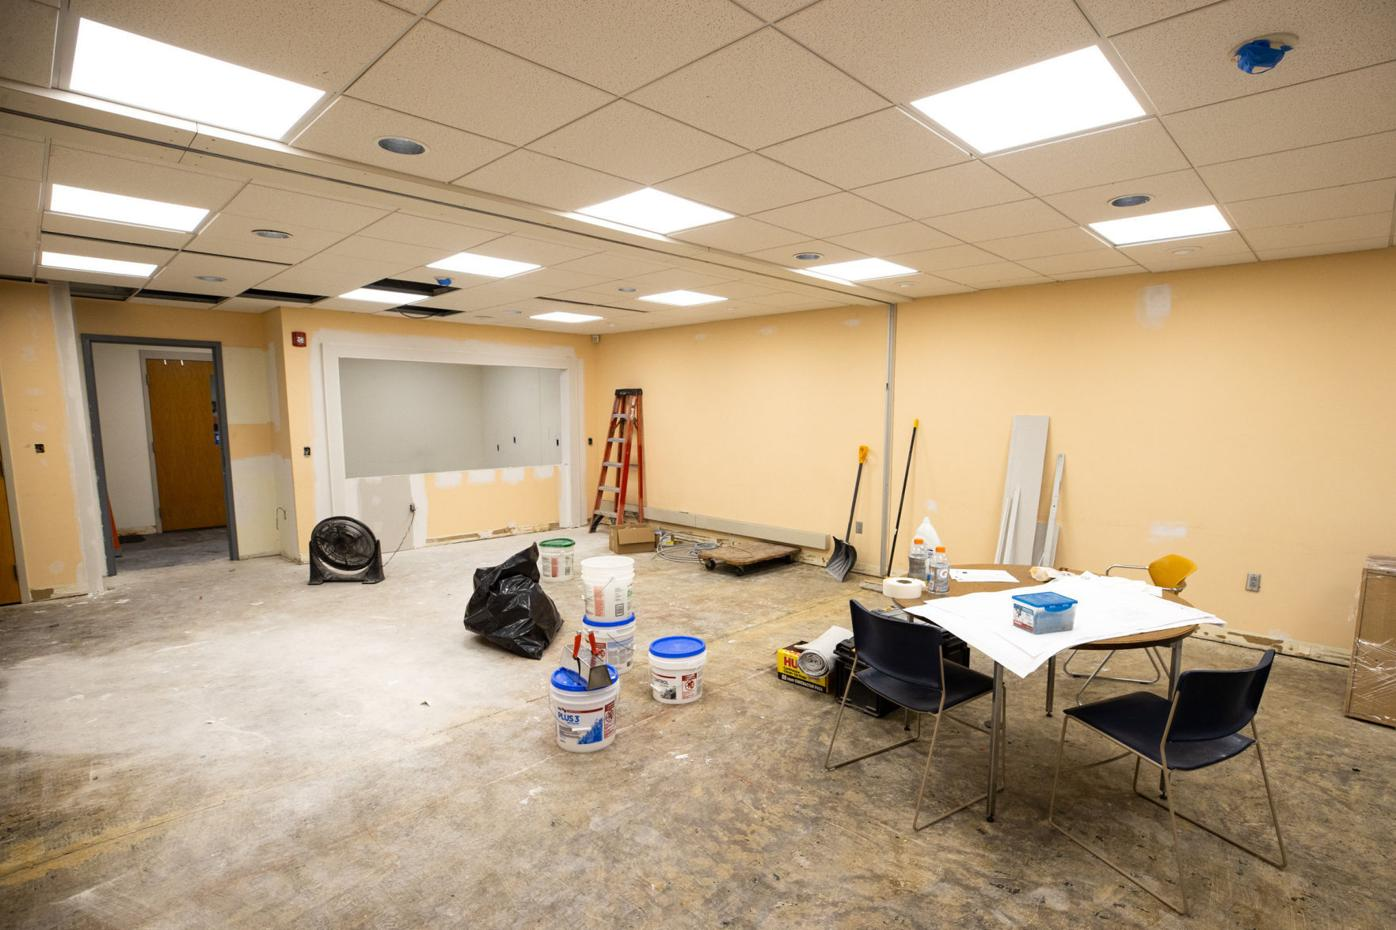 Abington Community Library undergoes renovations